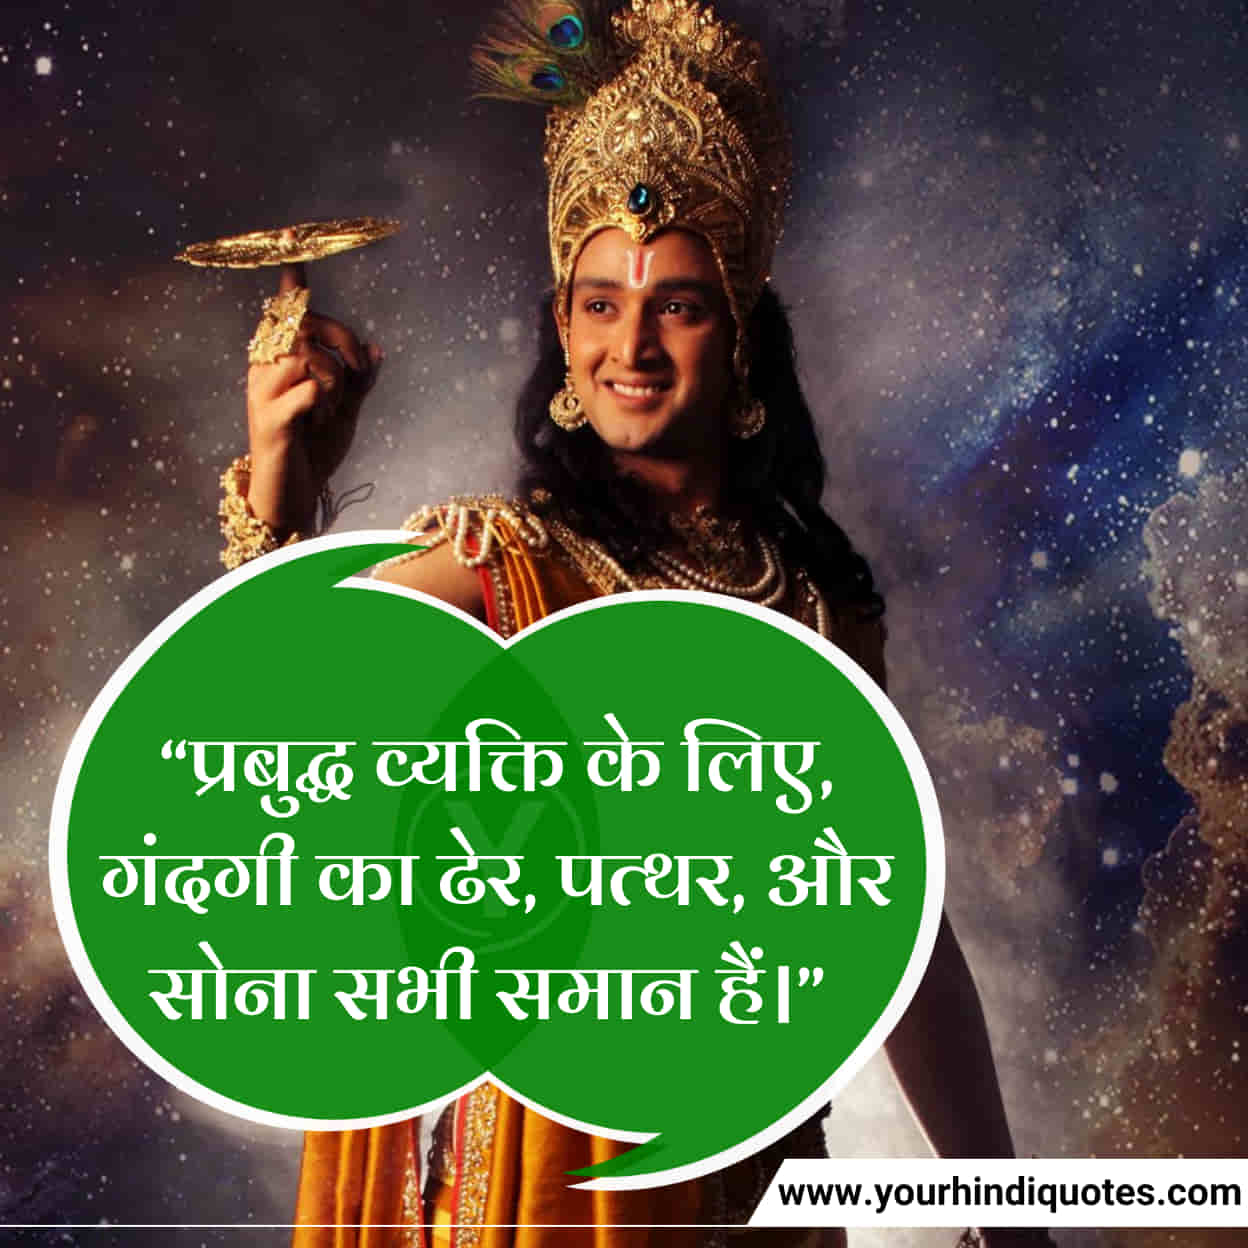 Shrimad Bhagwat Gita Quotes in Hindi